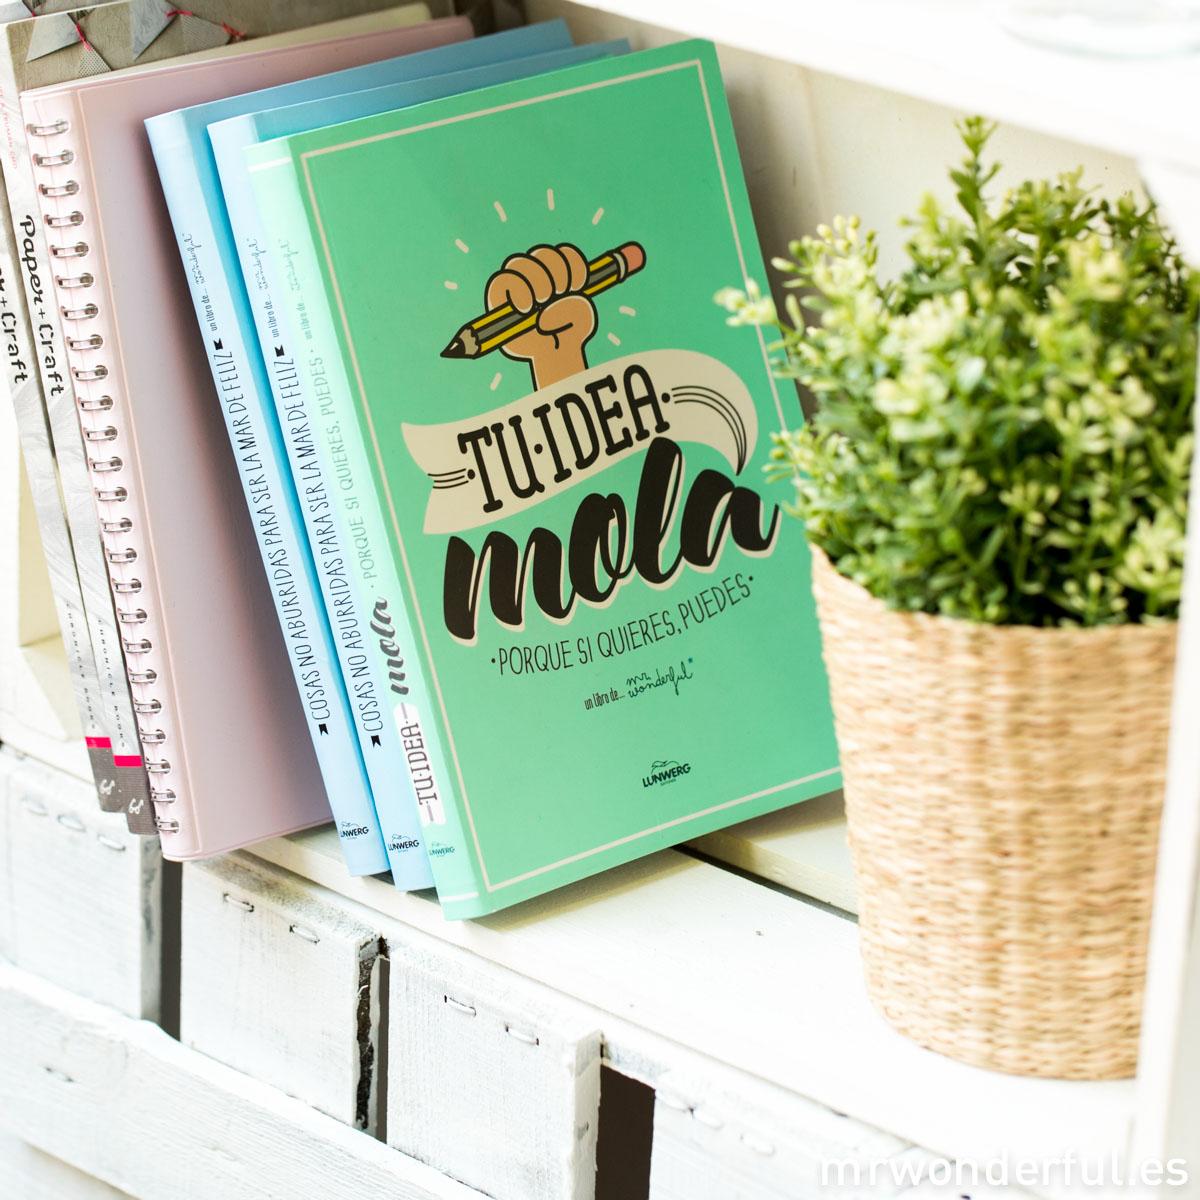 mrwonderful_libro-05_tu-idea-mola-29